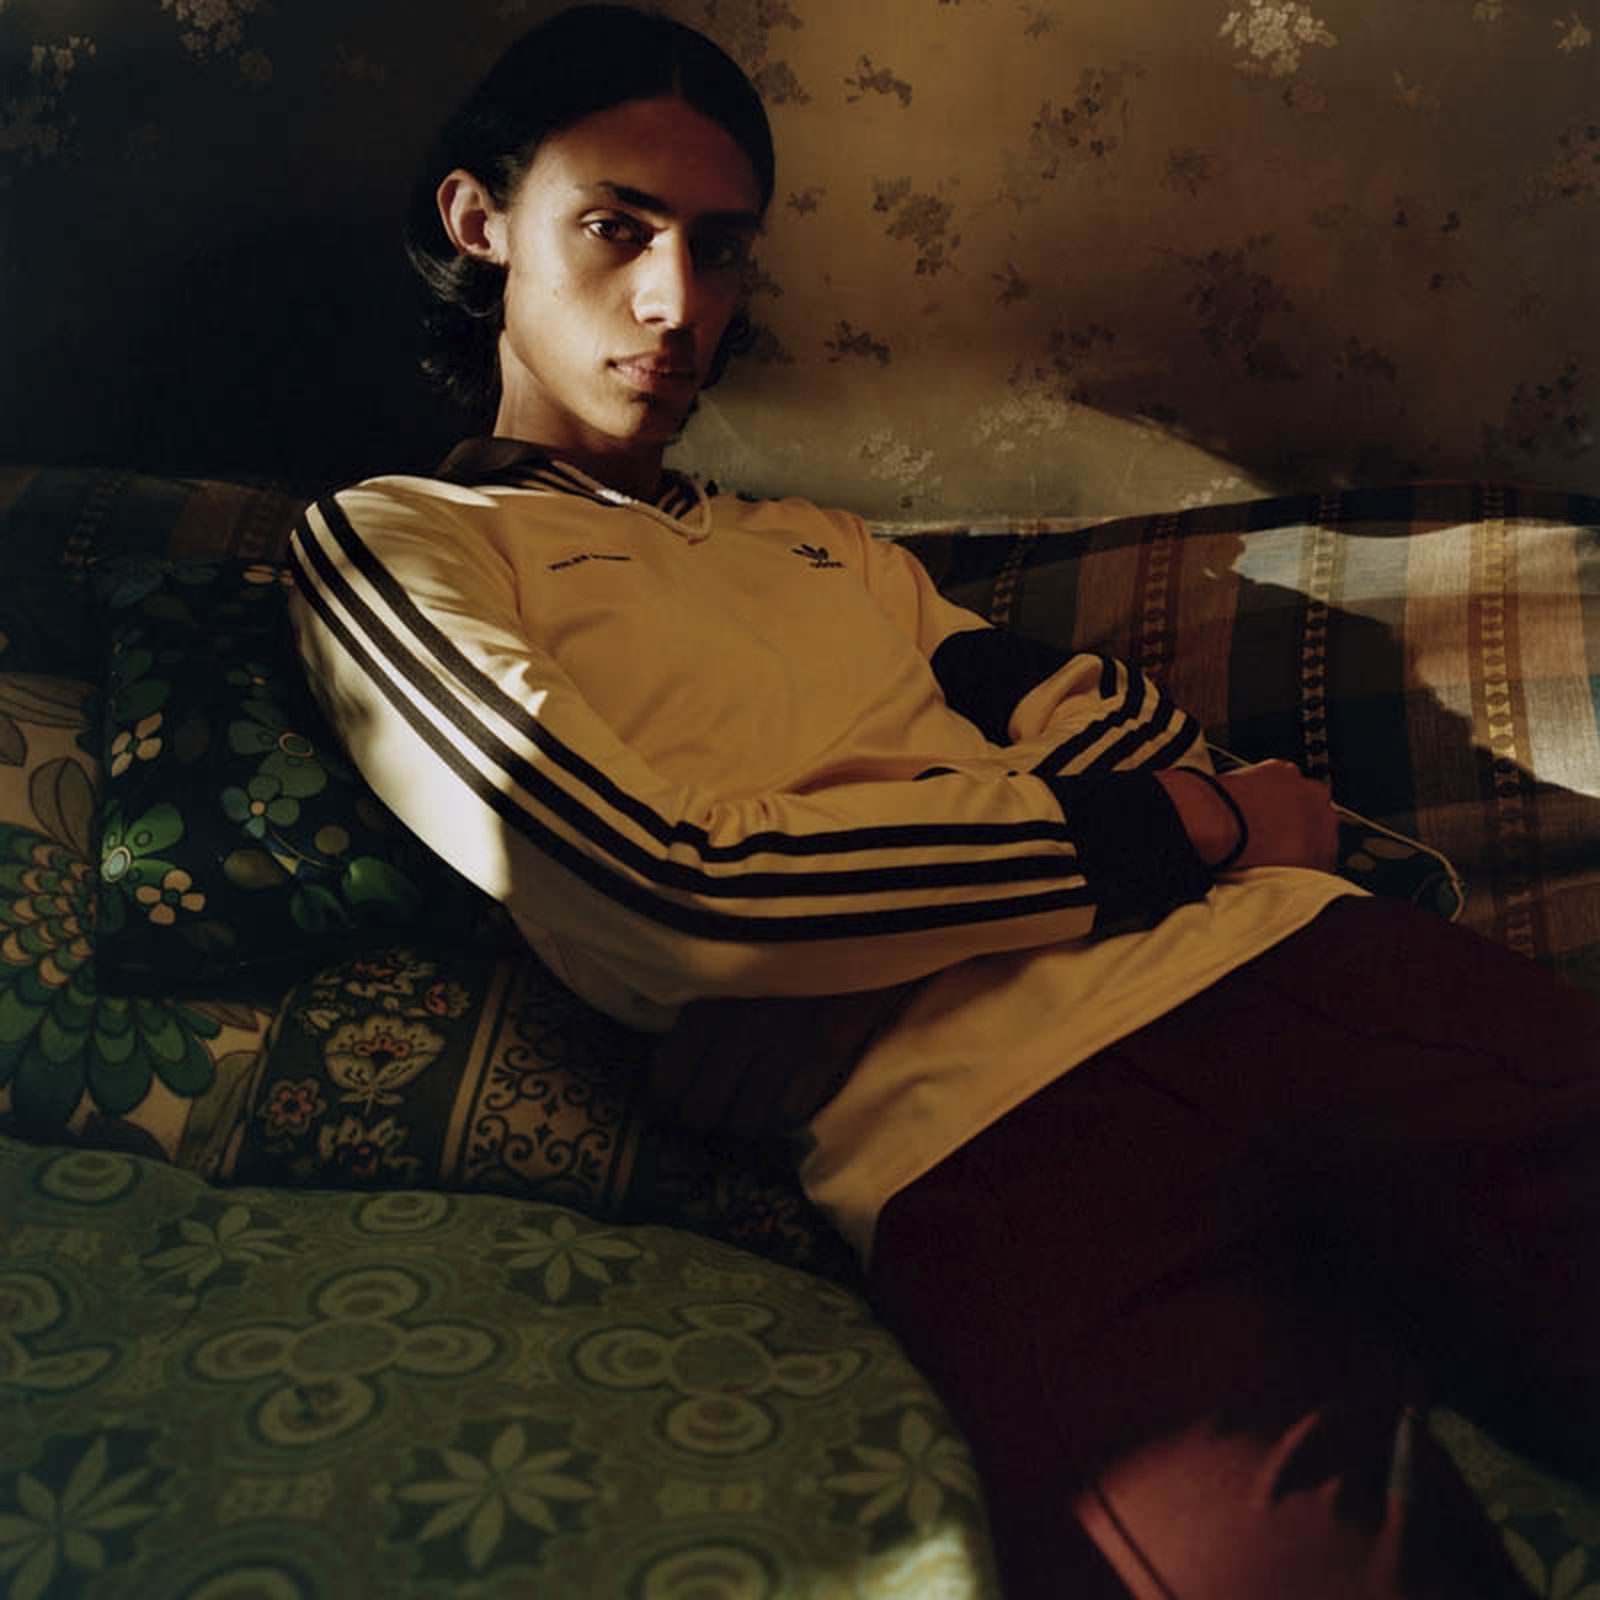 wales-bonner-adidas-originals-samba-release-date-price-campaign-04